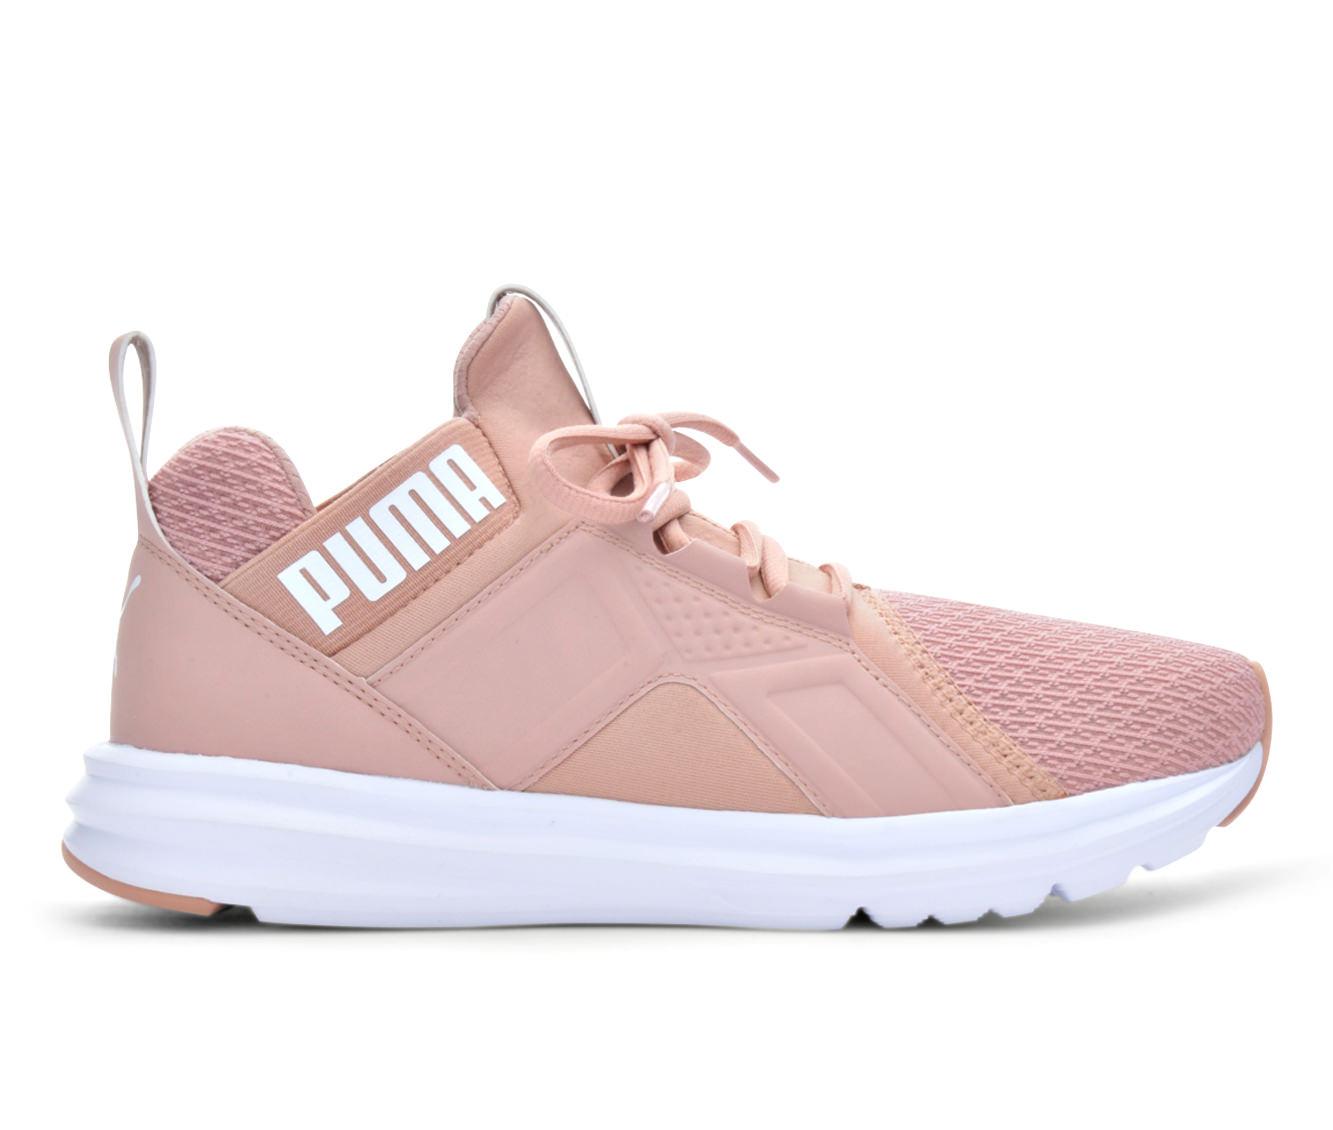 Women's Puma Zenvo Sneakers (Pink - Size 6) 1665754